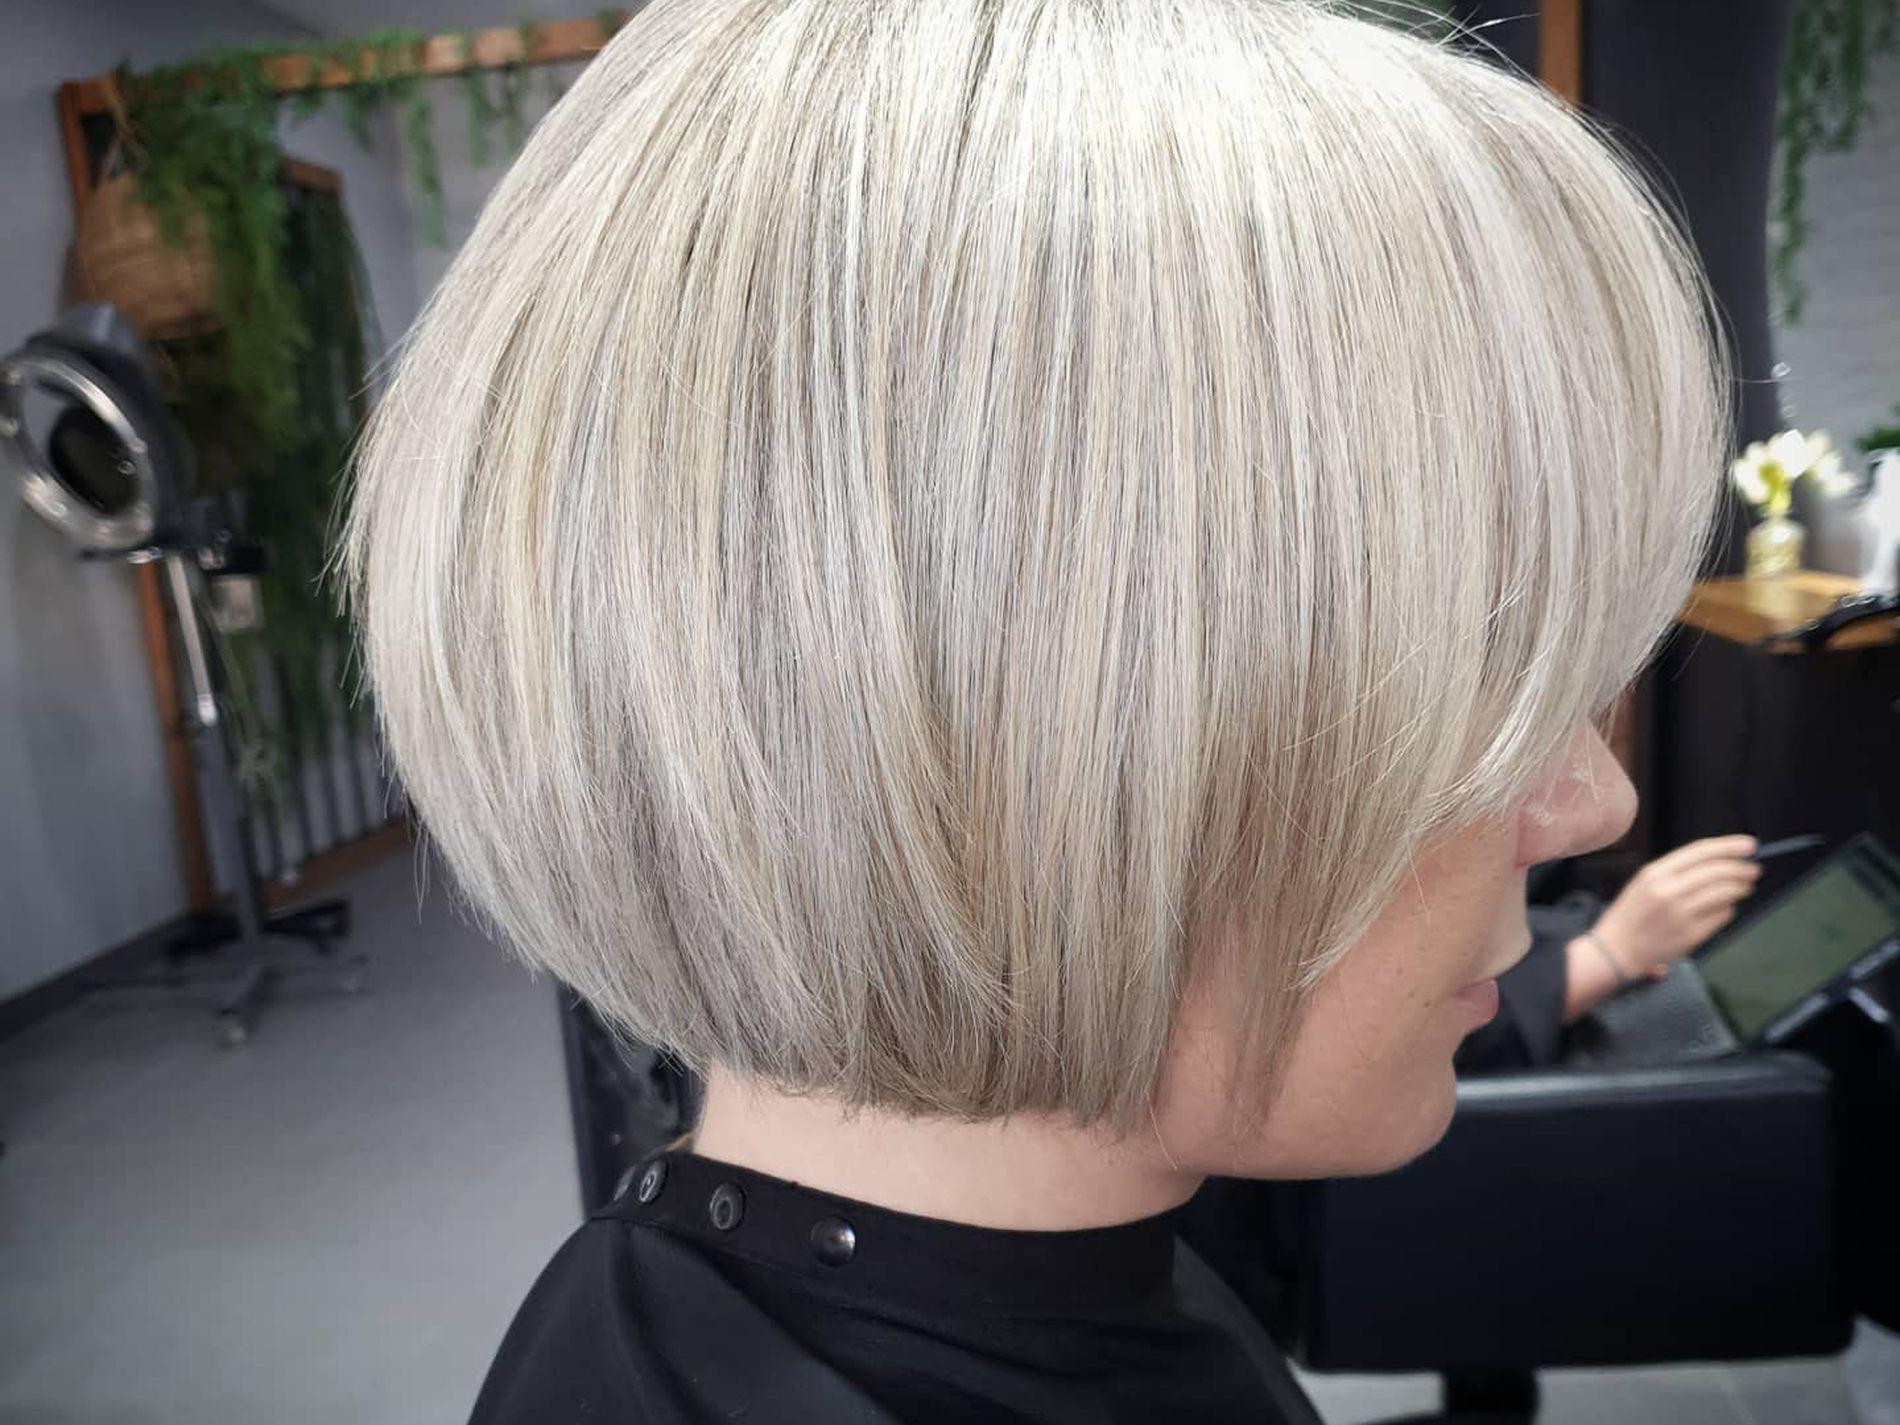 Mentone Hair Salon for Sale – Great location